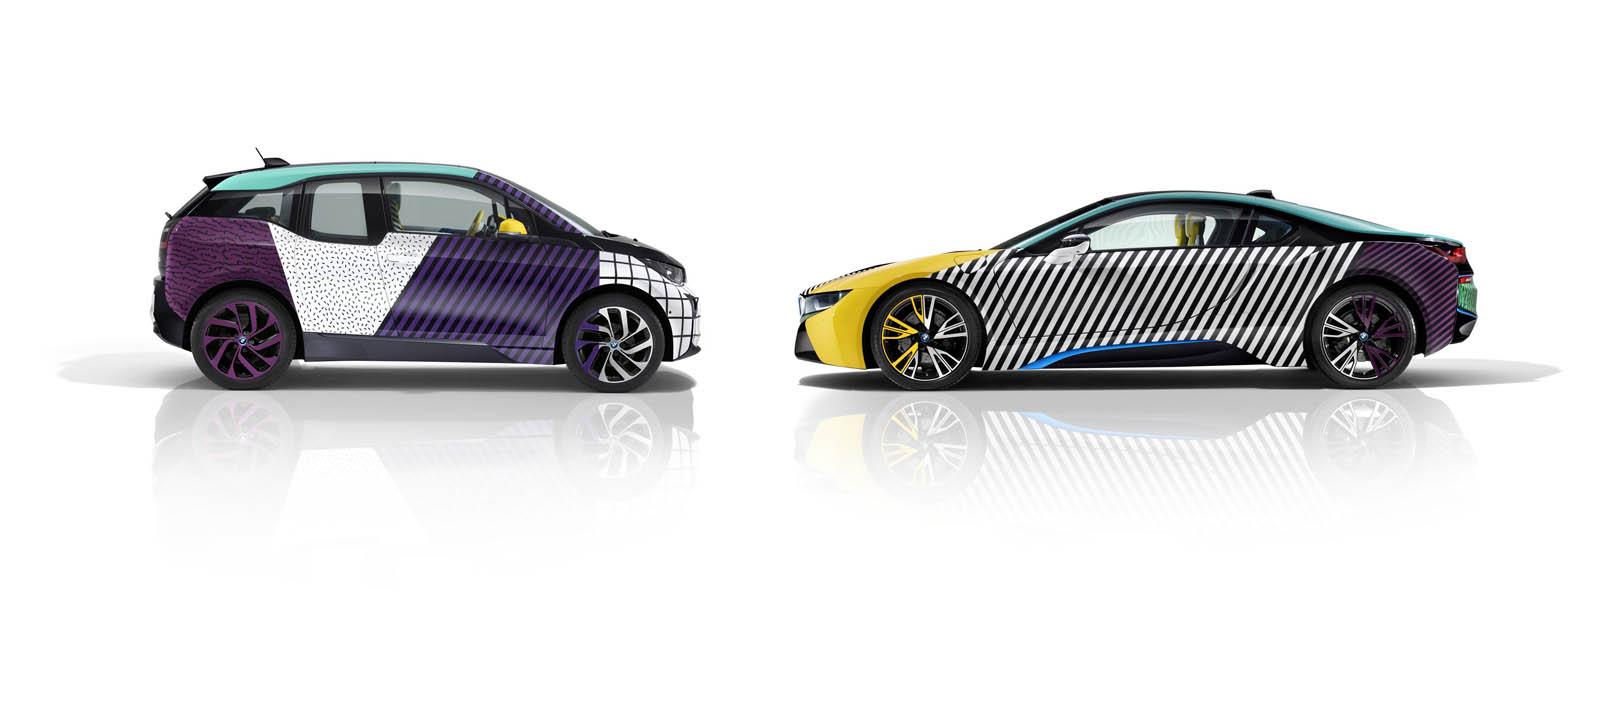 BMW i3 and i8 by Garage Italia Customs (21)